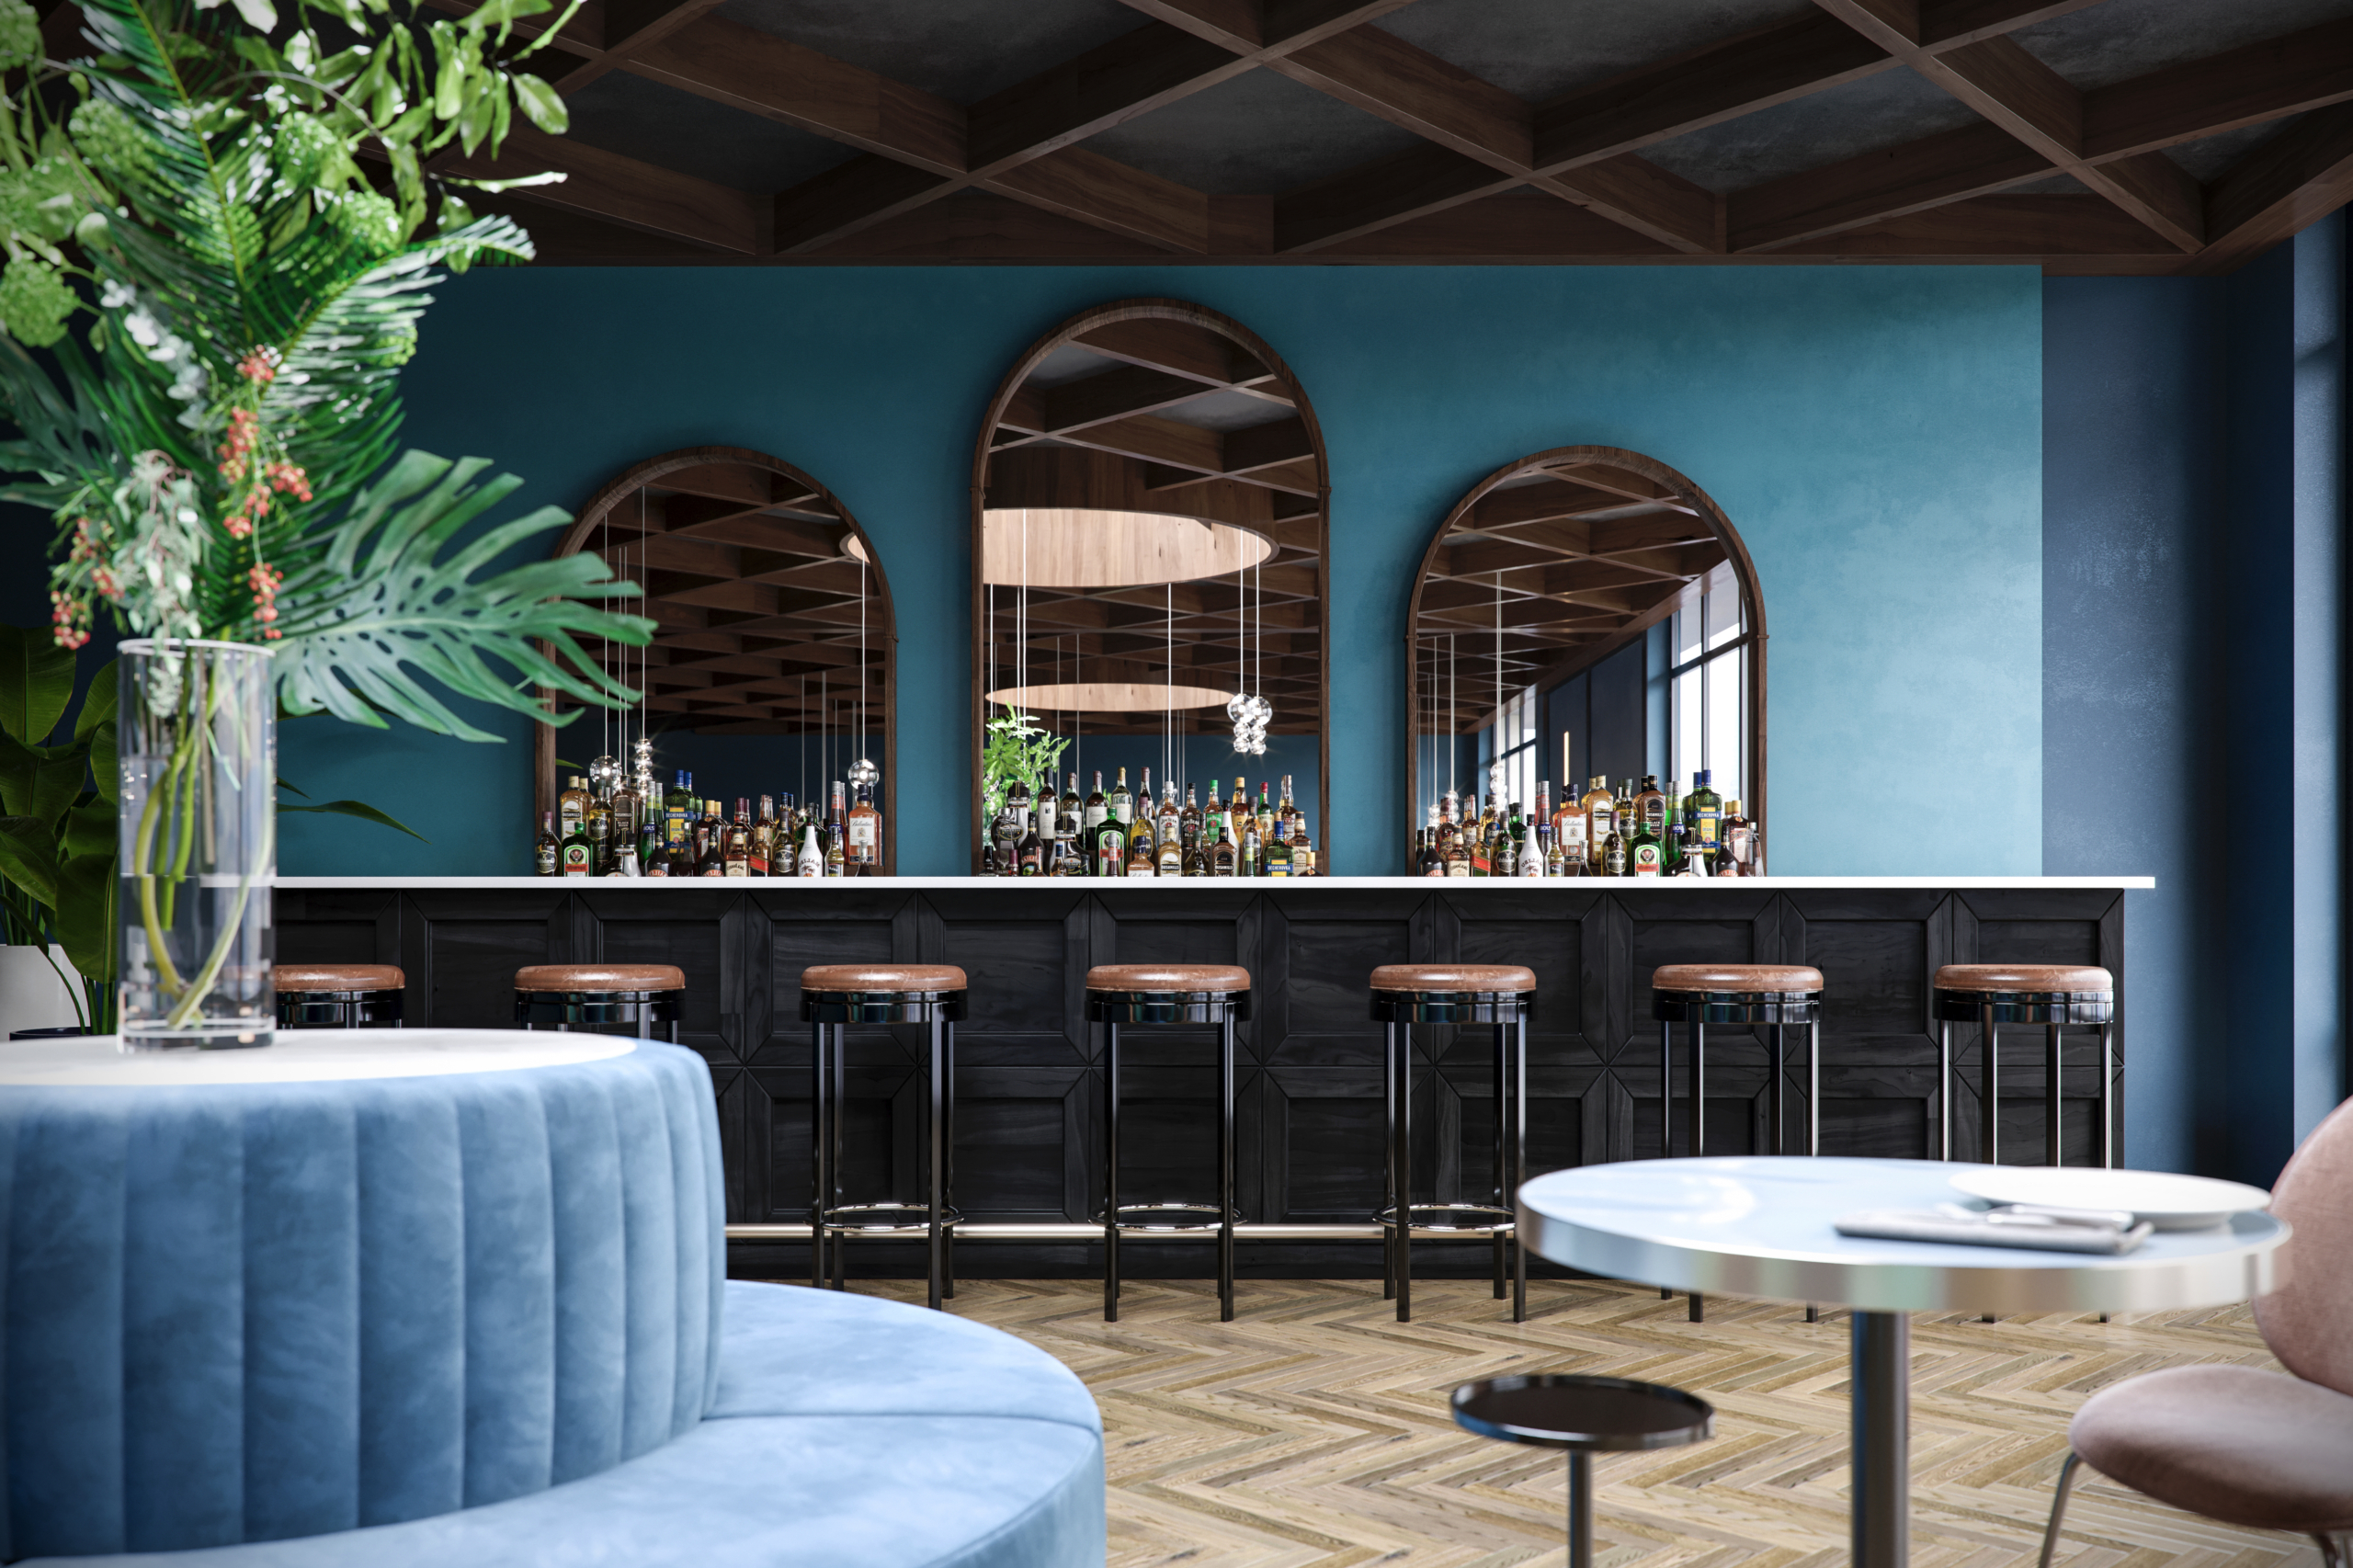 3d-rendering-restaurant-on-the-40-th-floor-new-york-usa-image-2